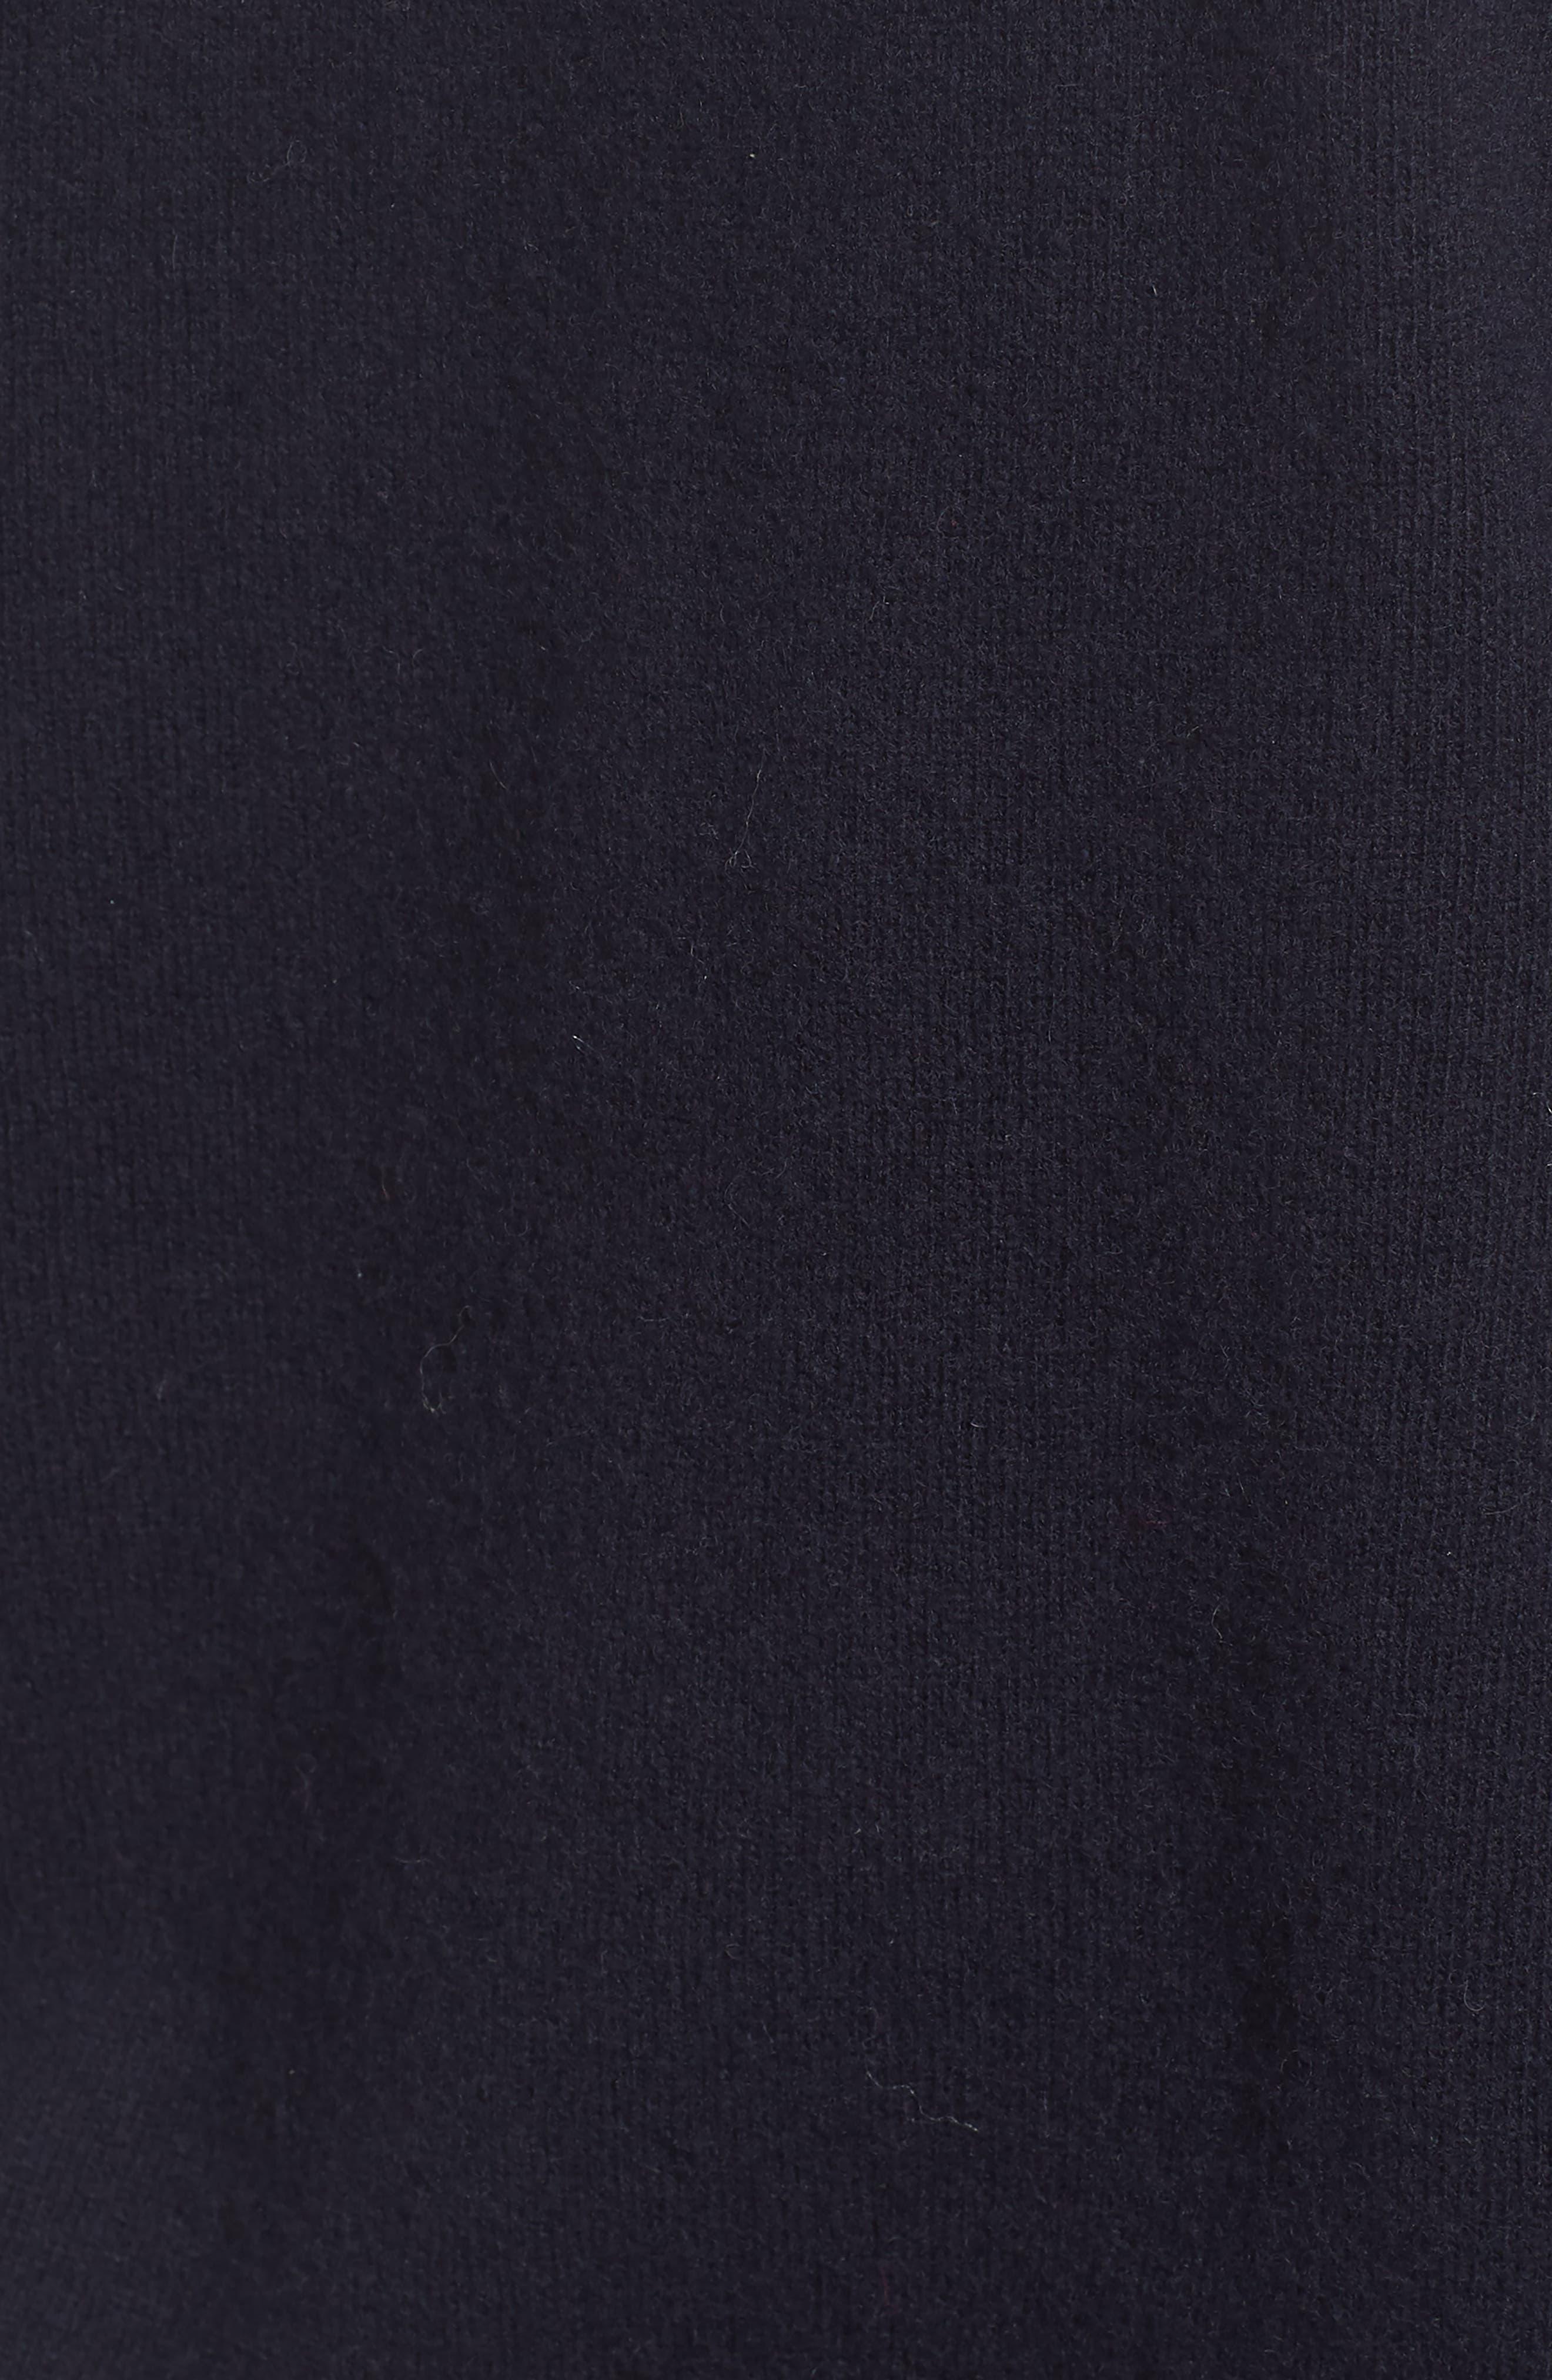 Crewneck Wool Sweater,                             Alternate thumbnail 5, color,                             Marine Blue/ Tartan